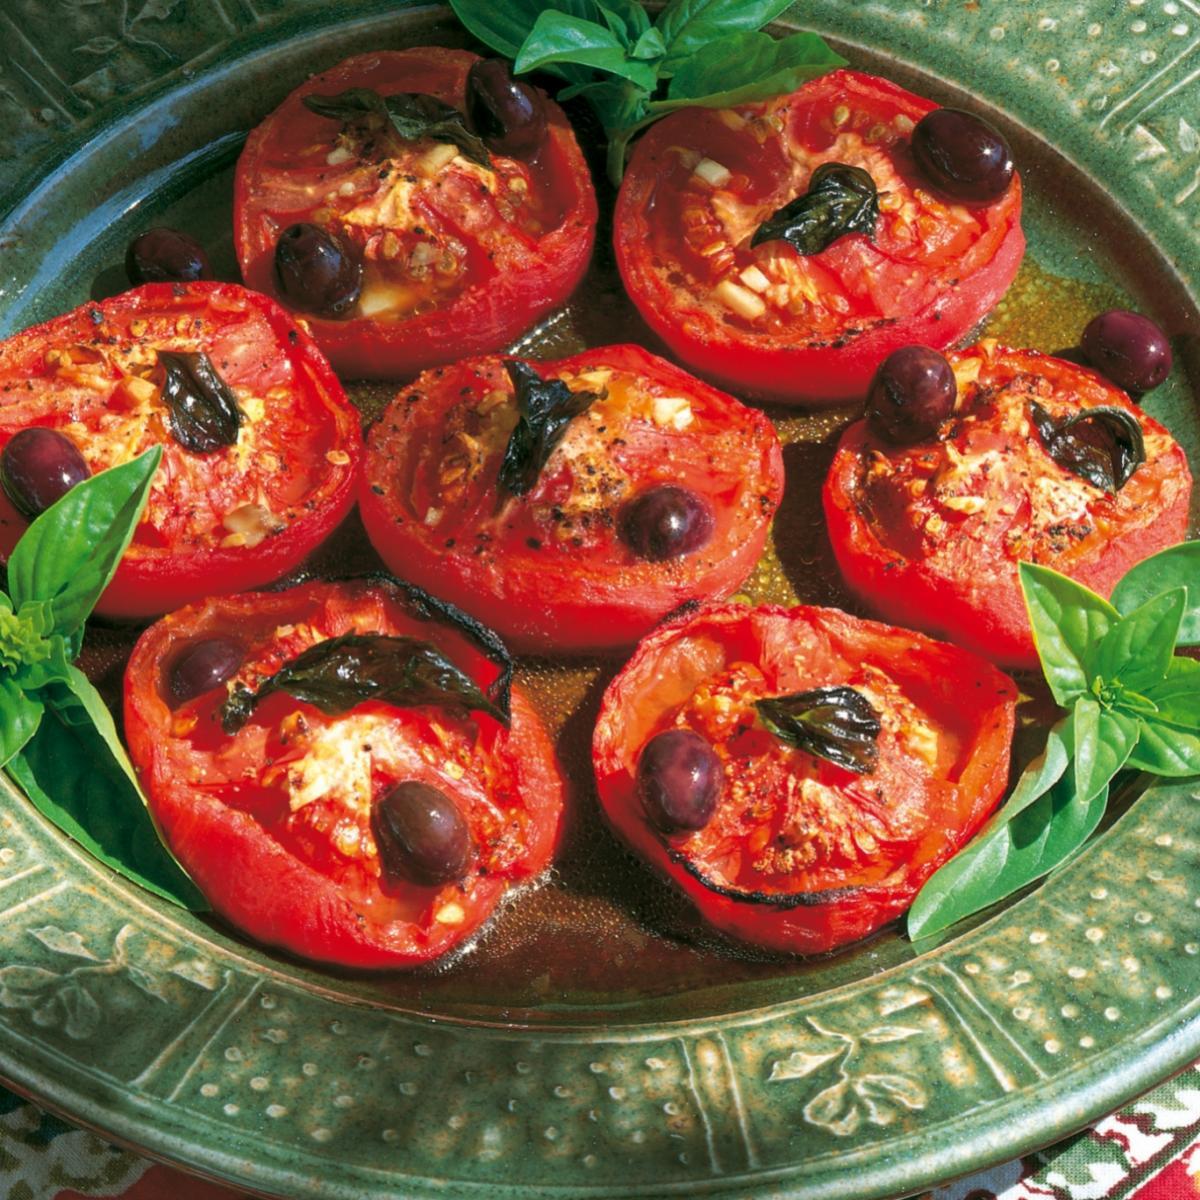 Summer roasted tomato salad